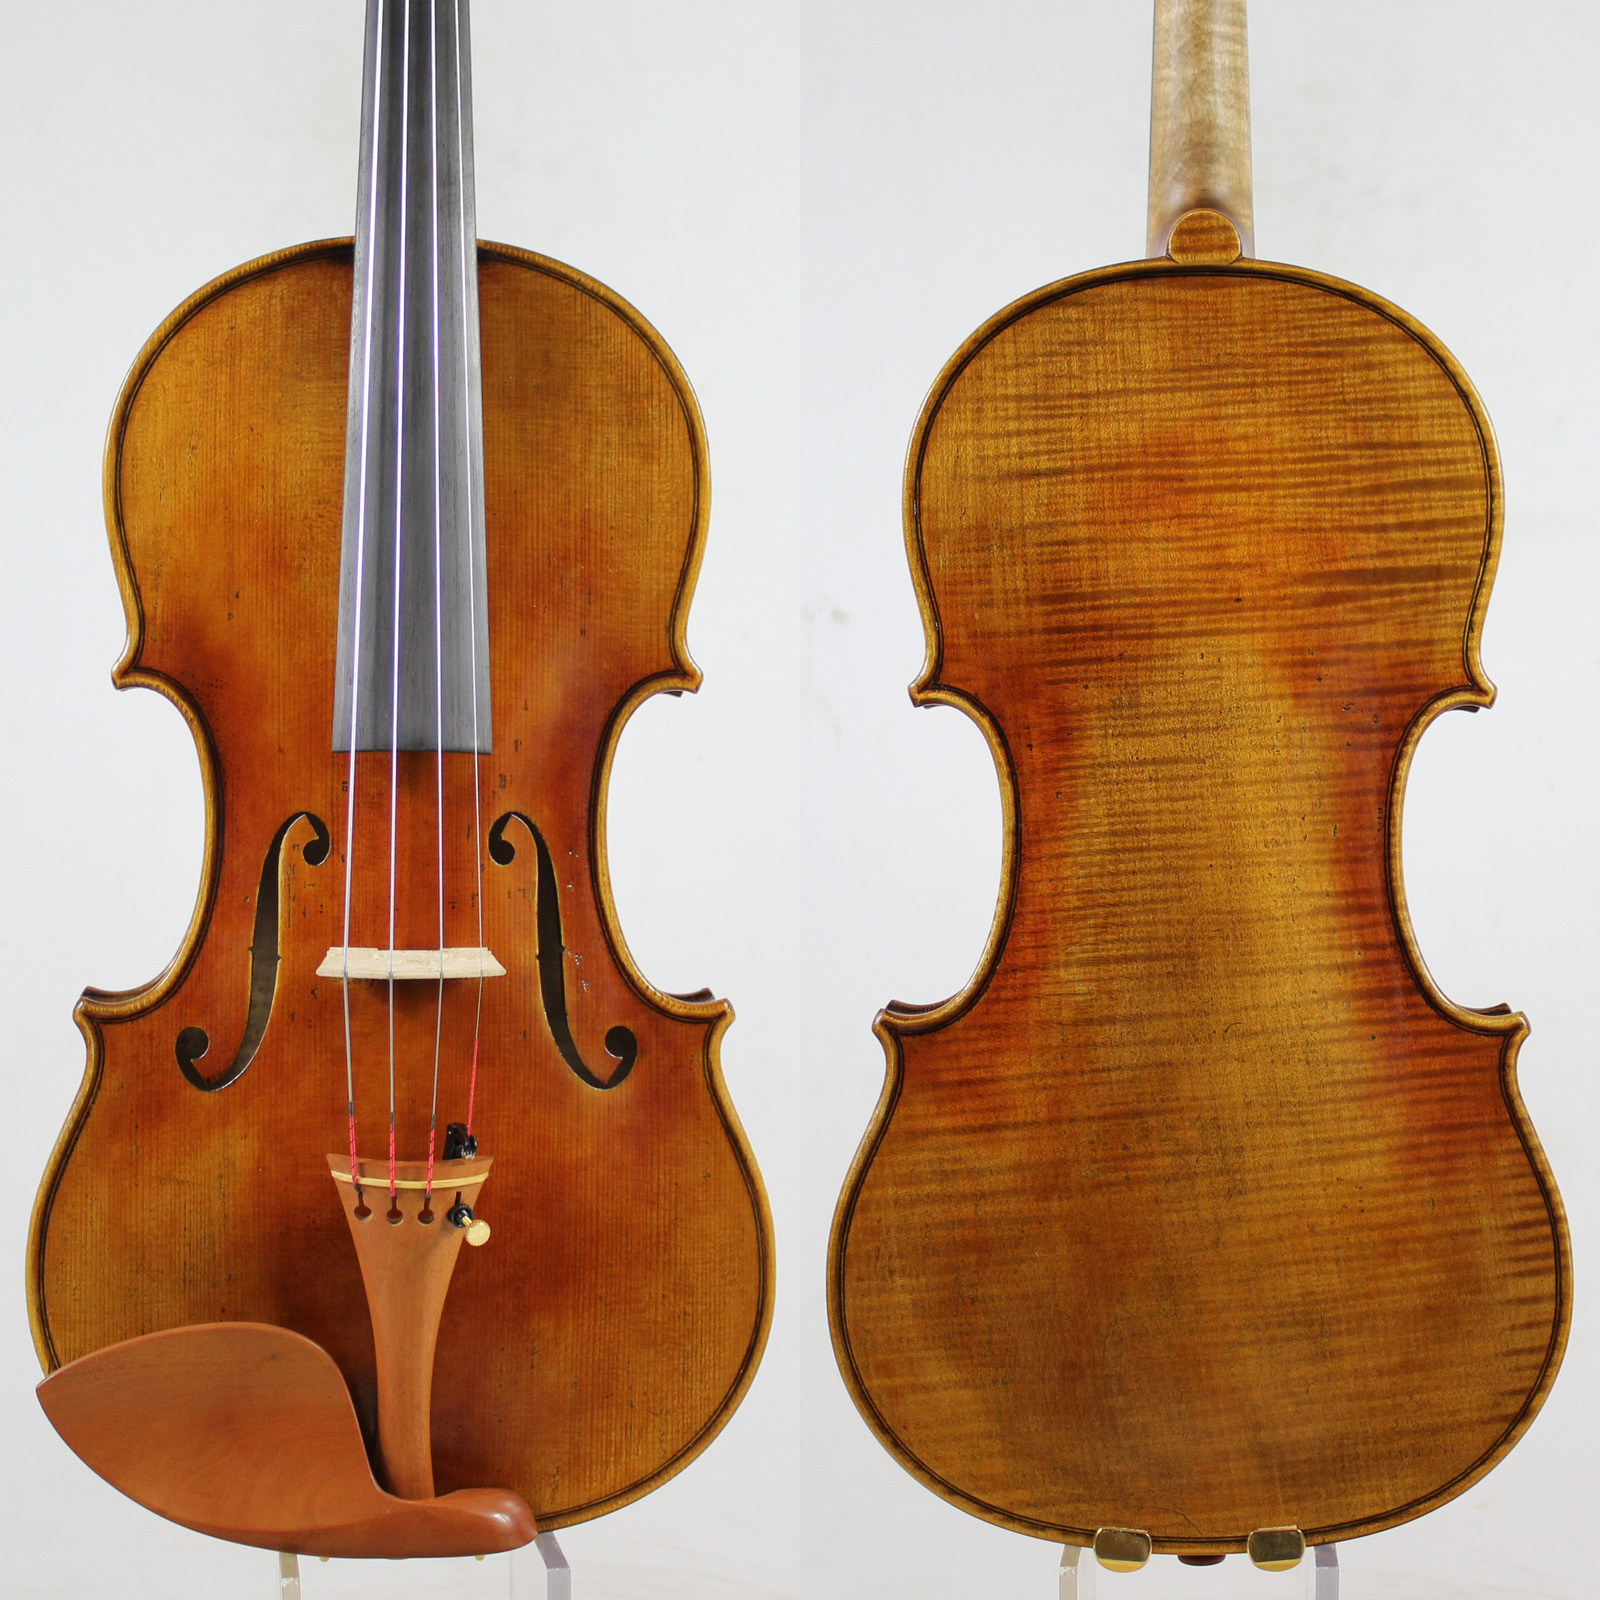 60 y old Spruce Guarnieri del Gesu Ole Bull Violin violino Copy M9018 One Pc Back